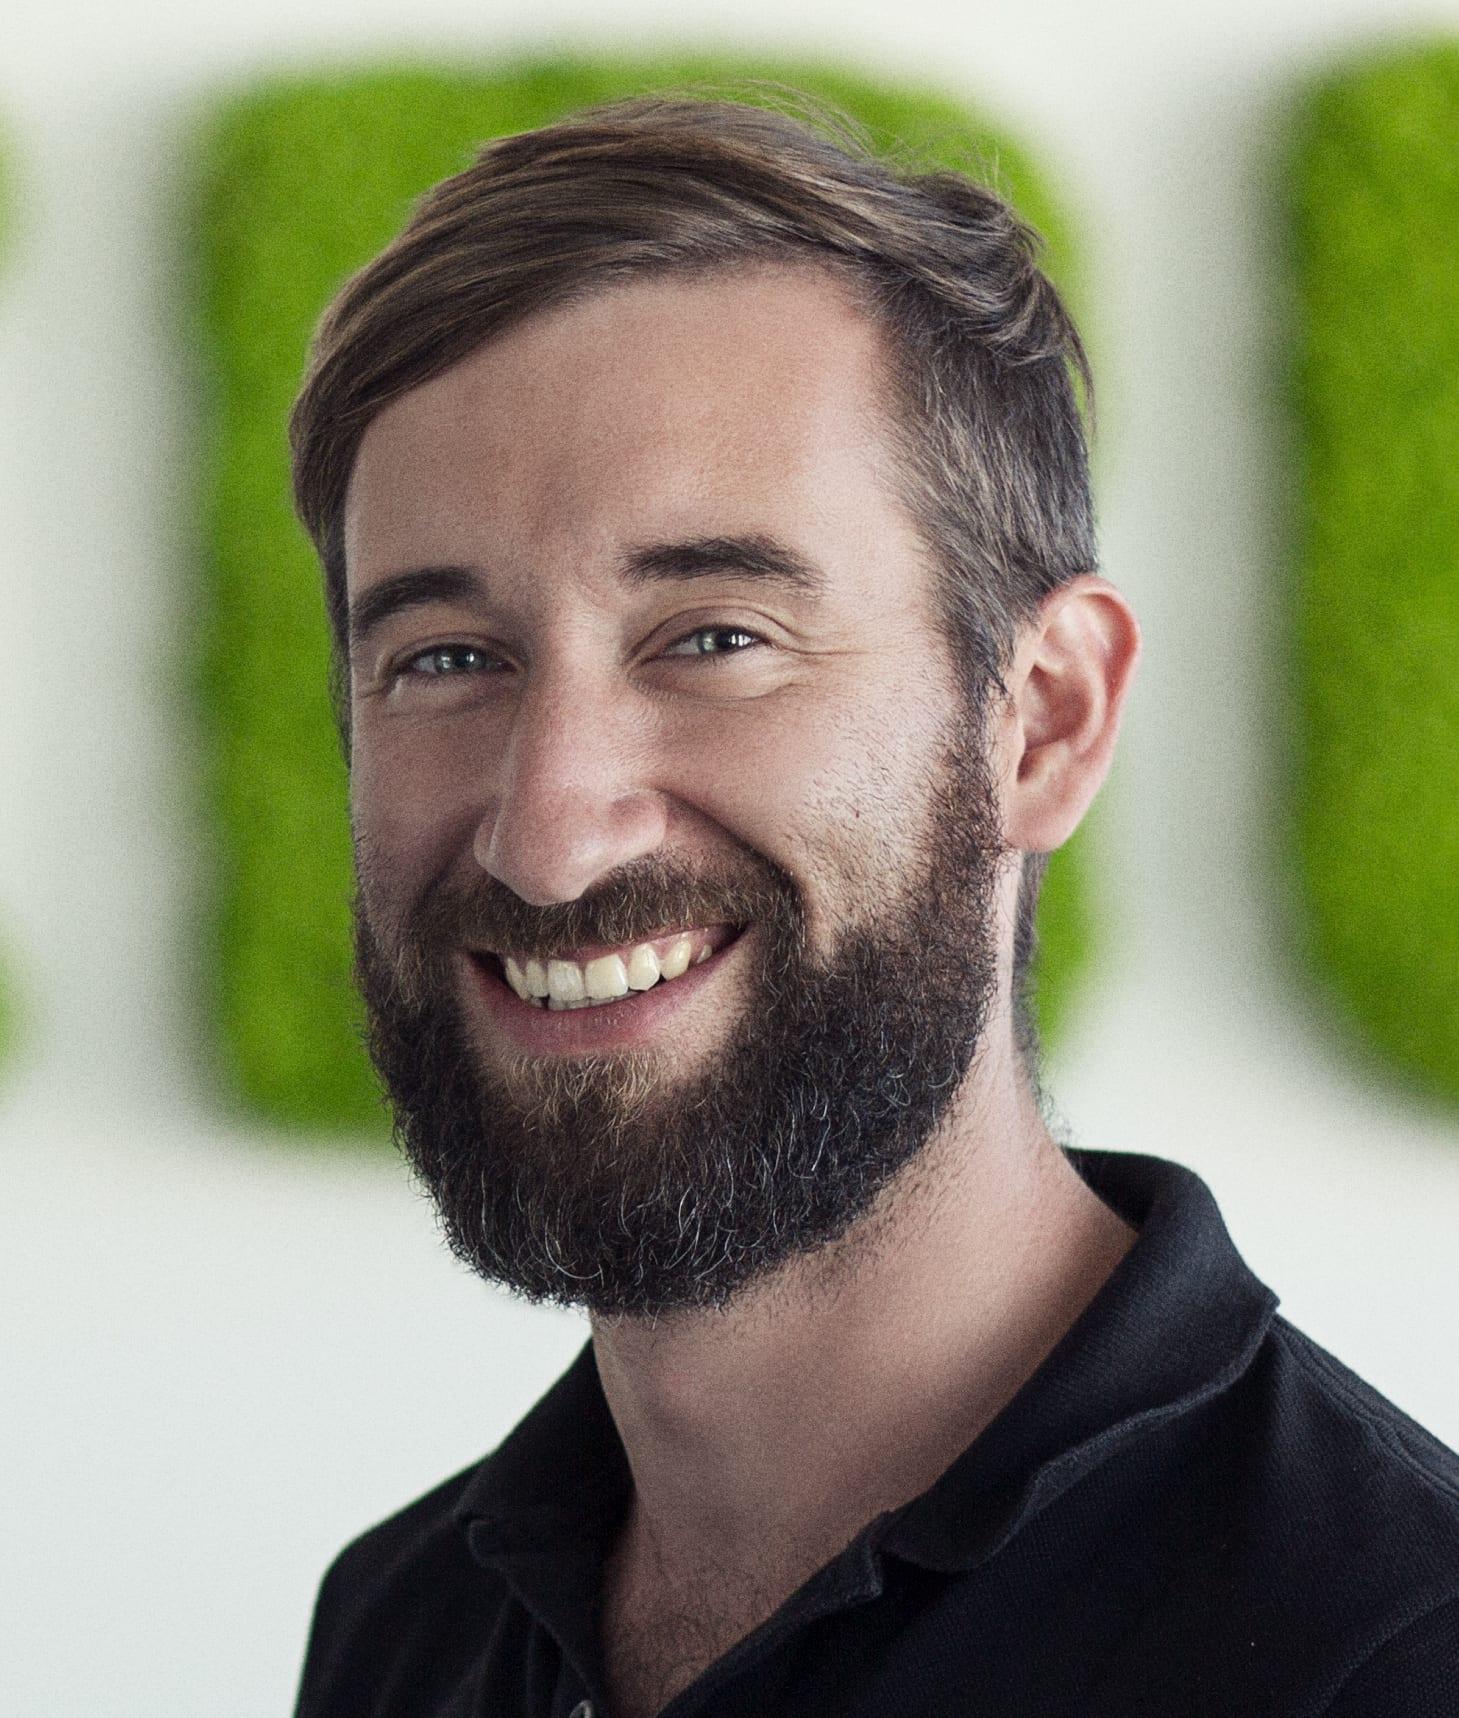 Daniel Krauss FlixBus-Gründer